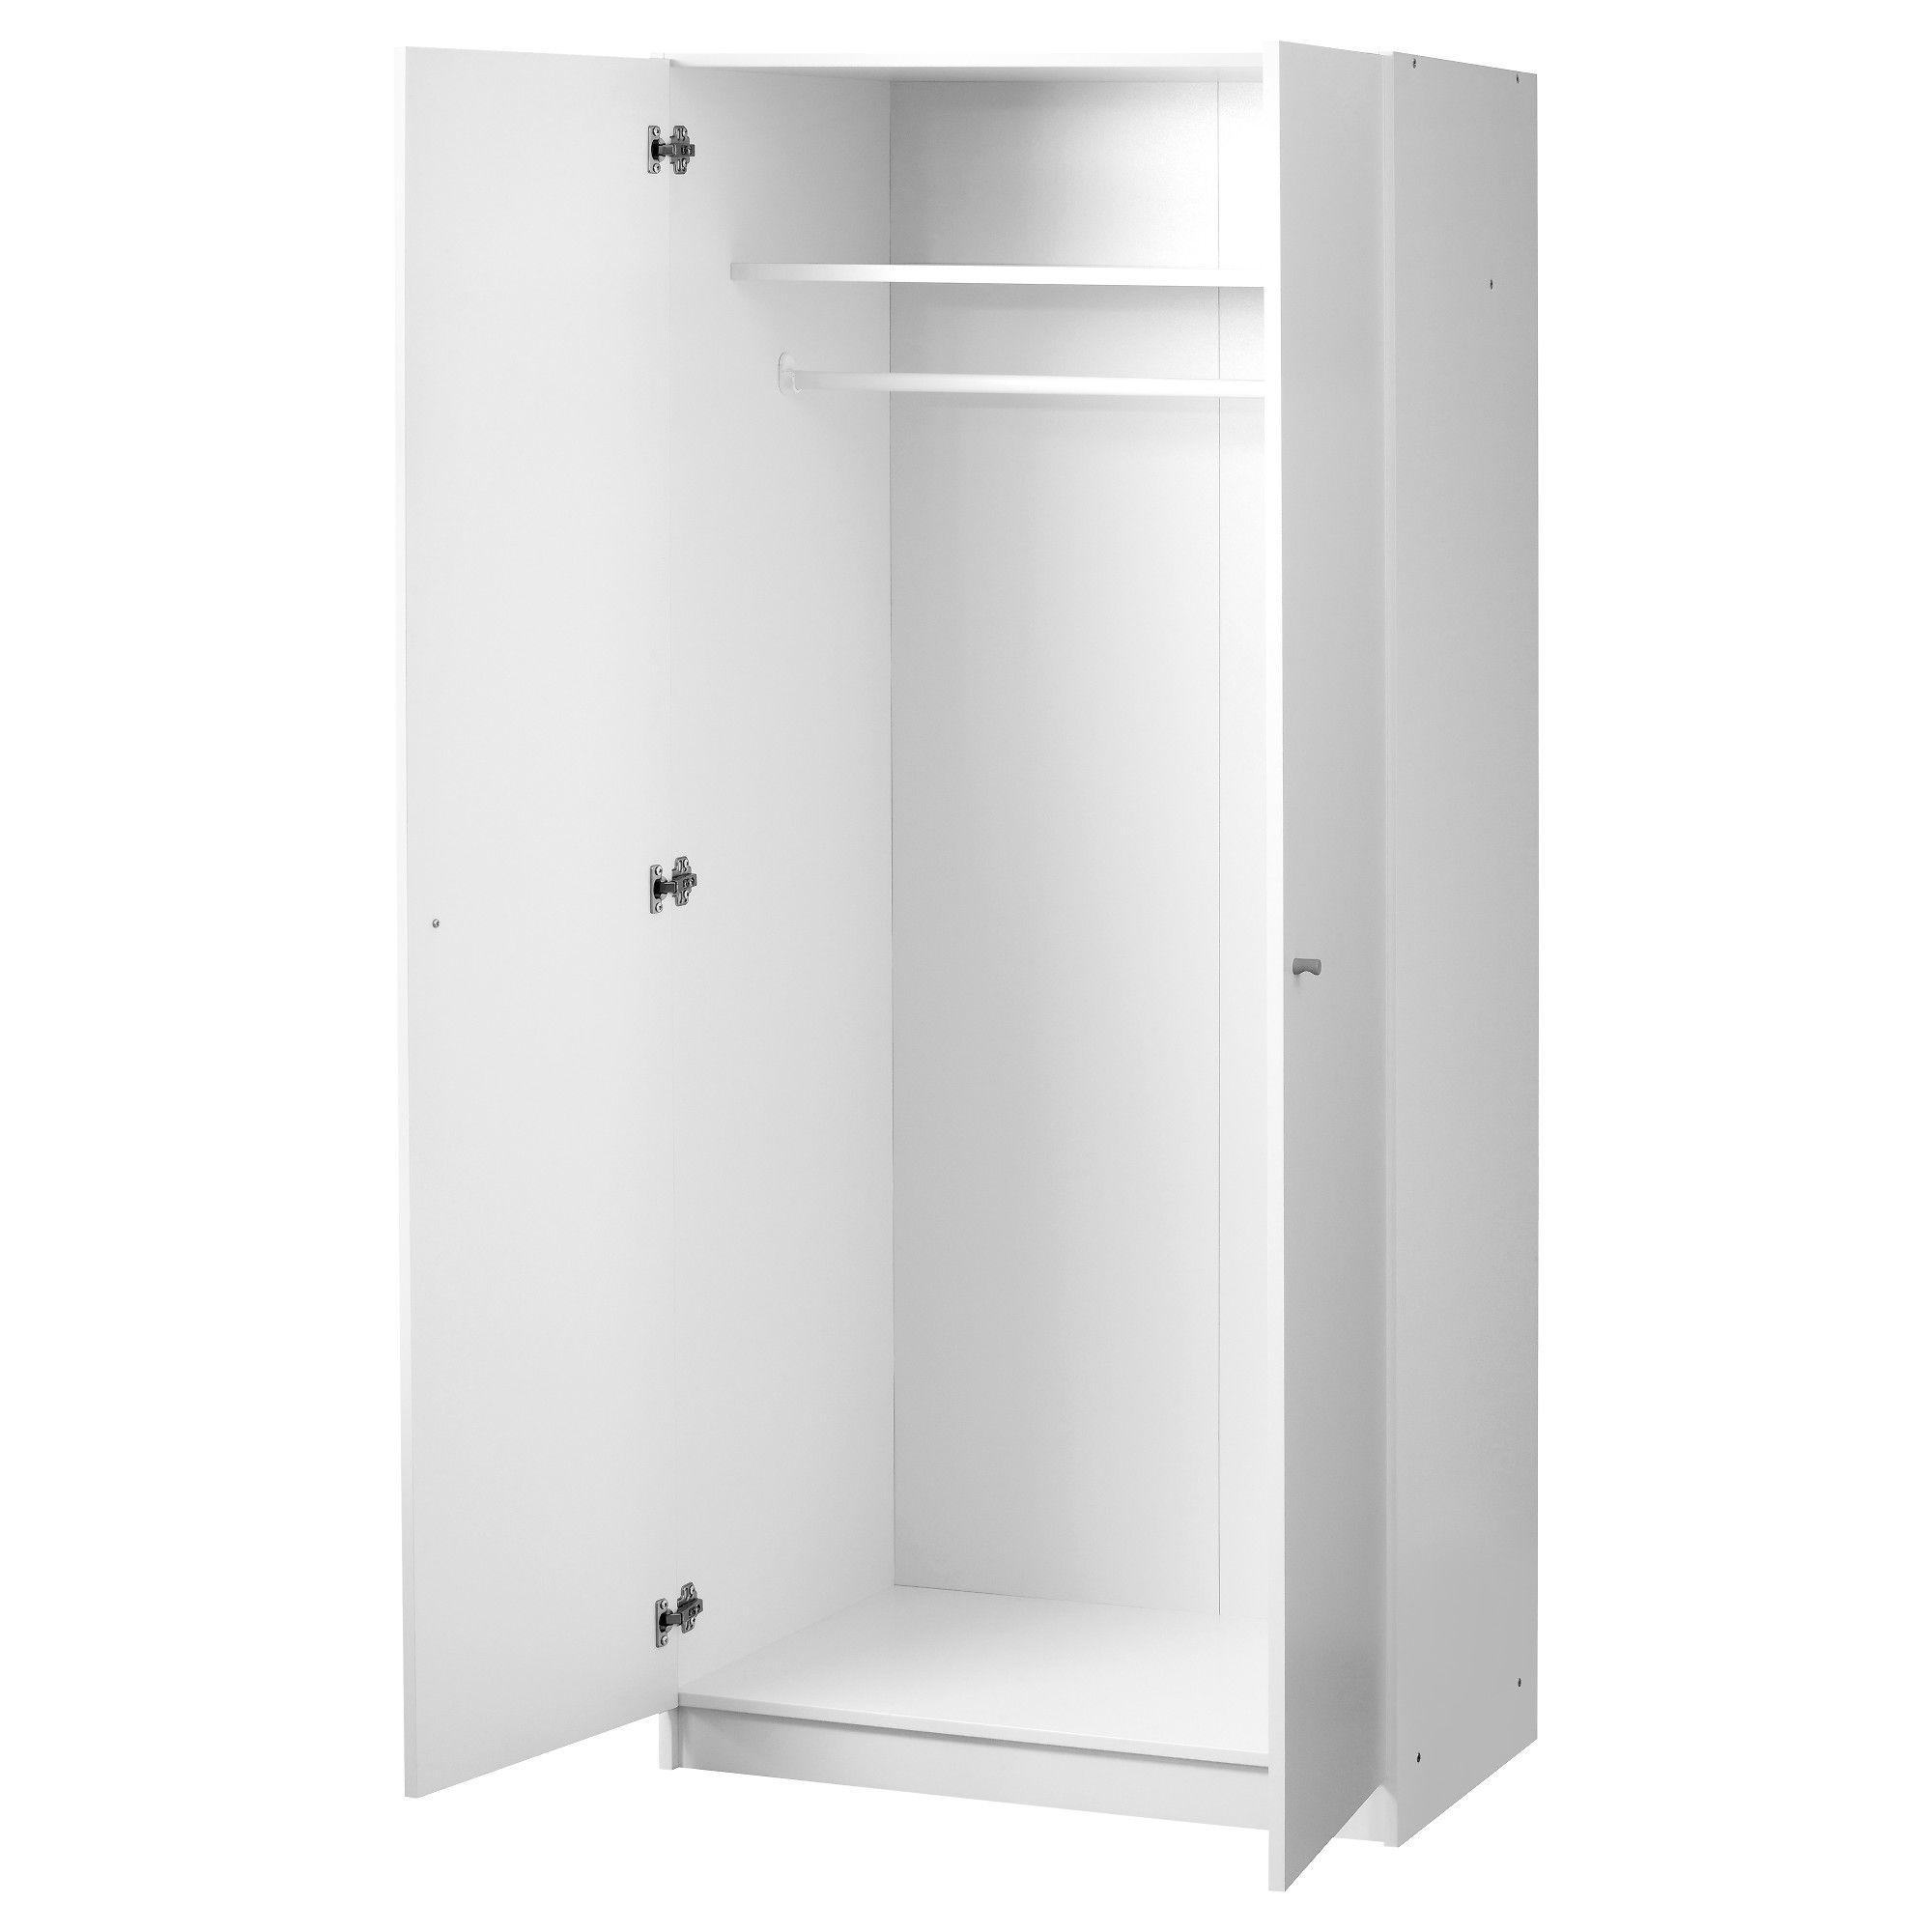 BOSTRAK Wardrobe White IKEA